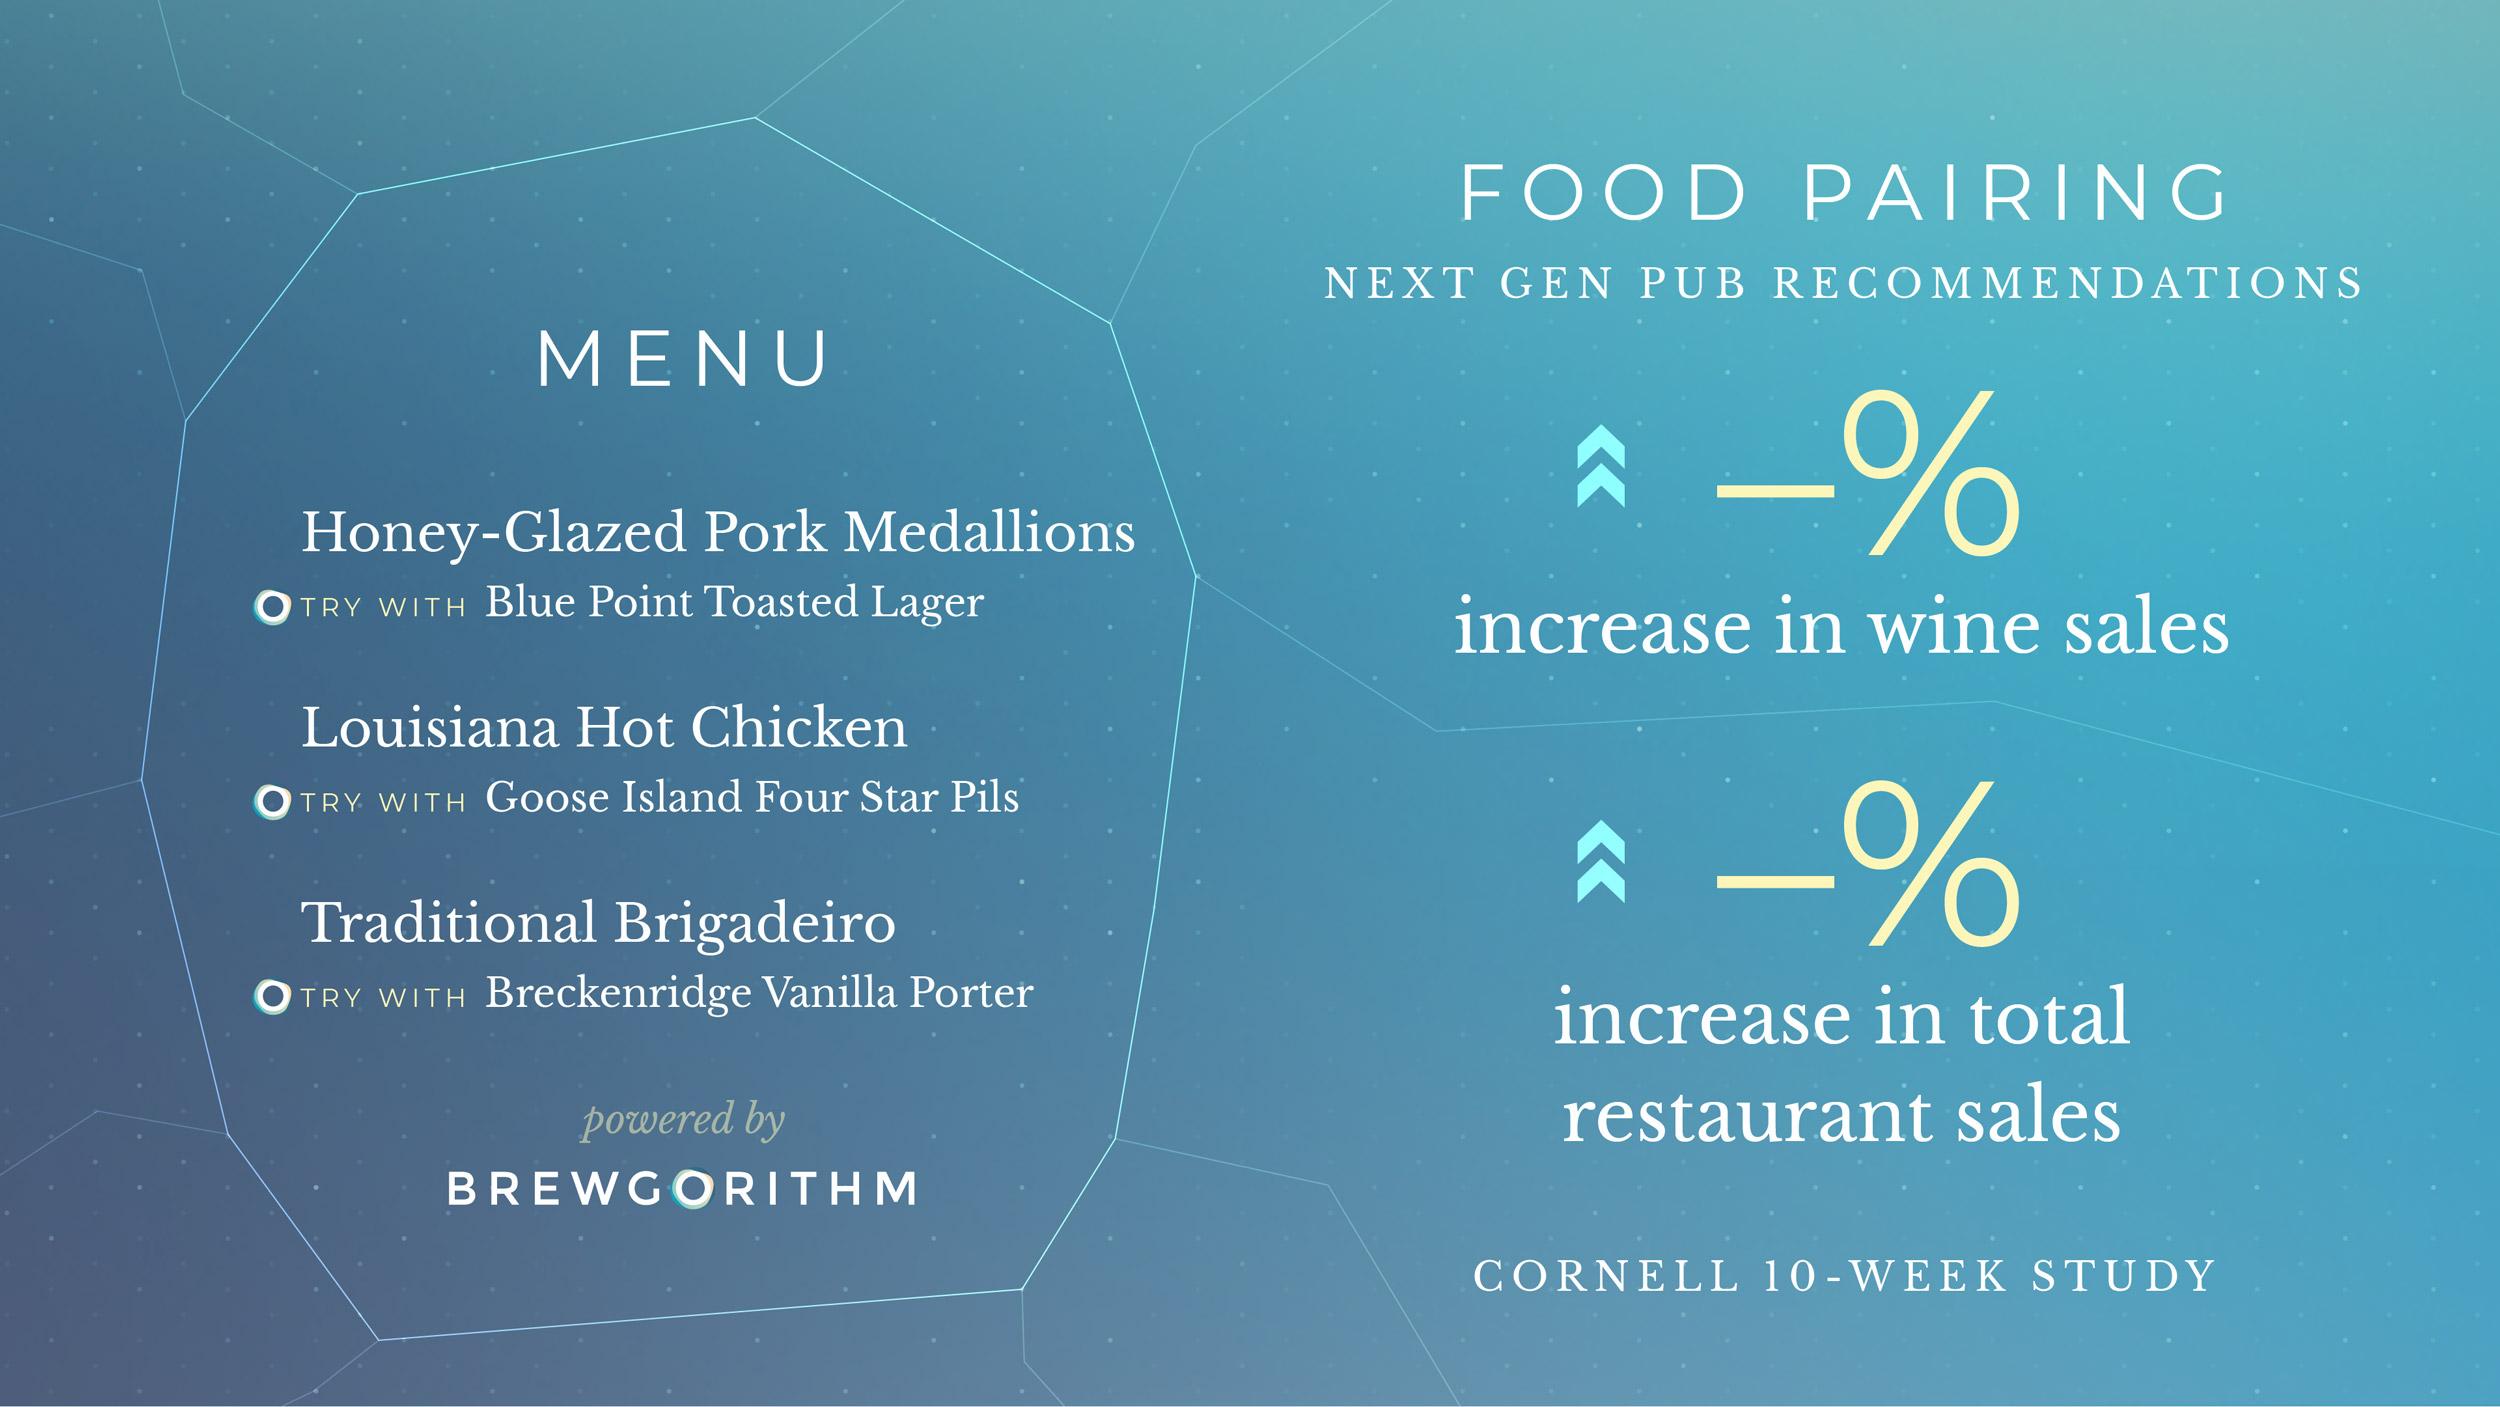 meng-he-brewgorithm-slide-menu